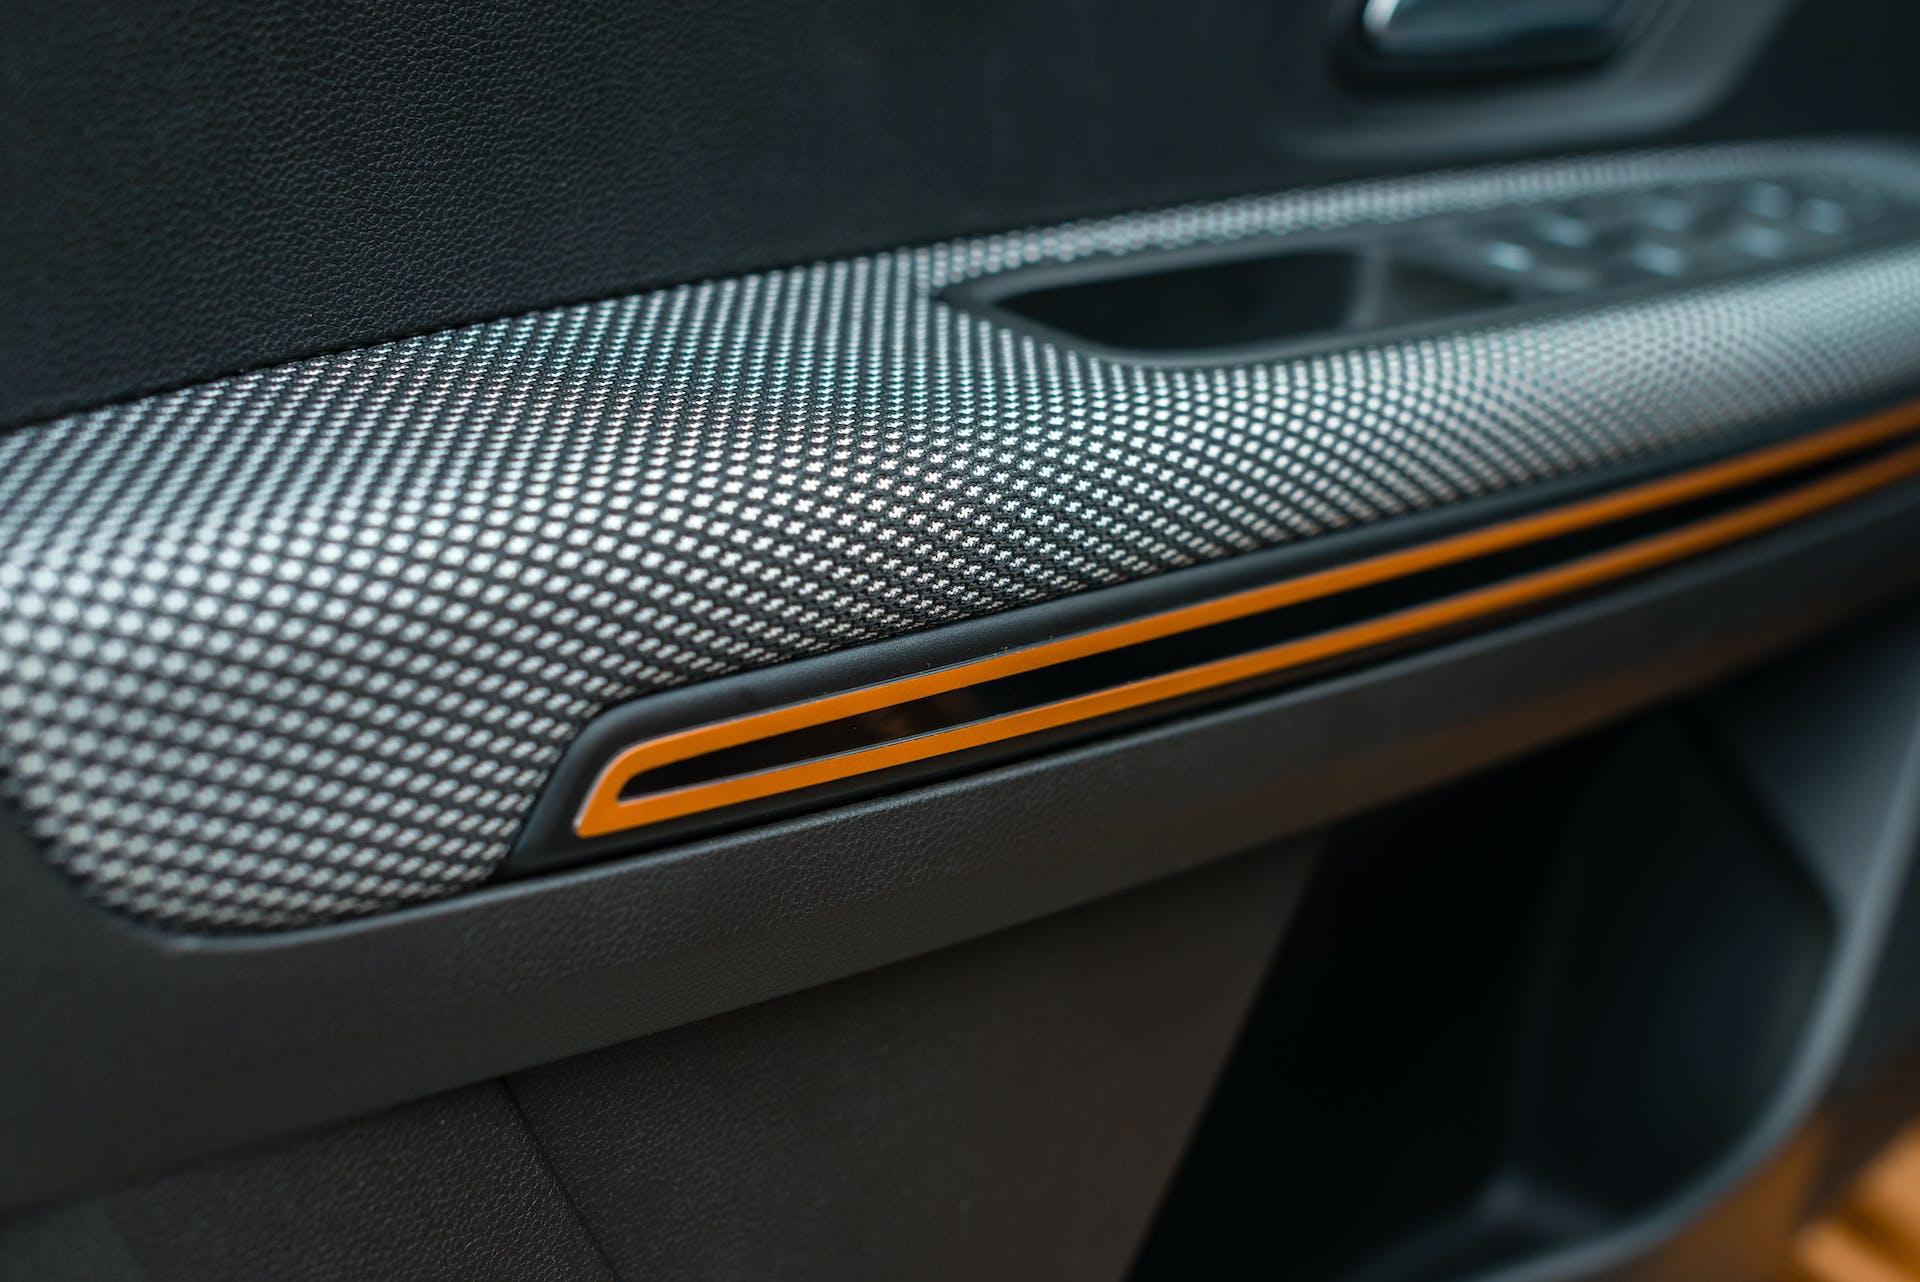 Prova nuova Dacia Sandero Strepway - pannello porta